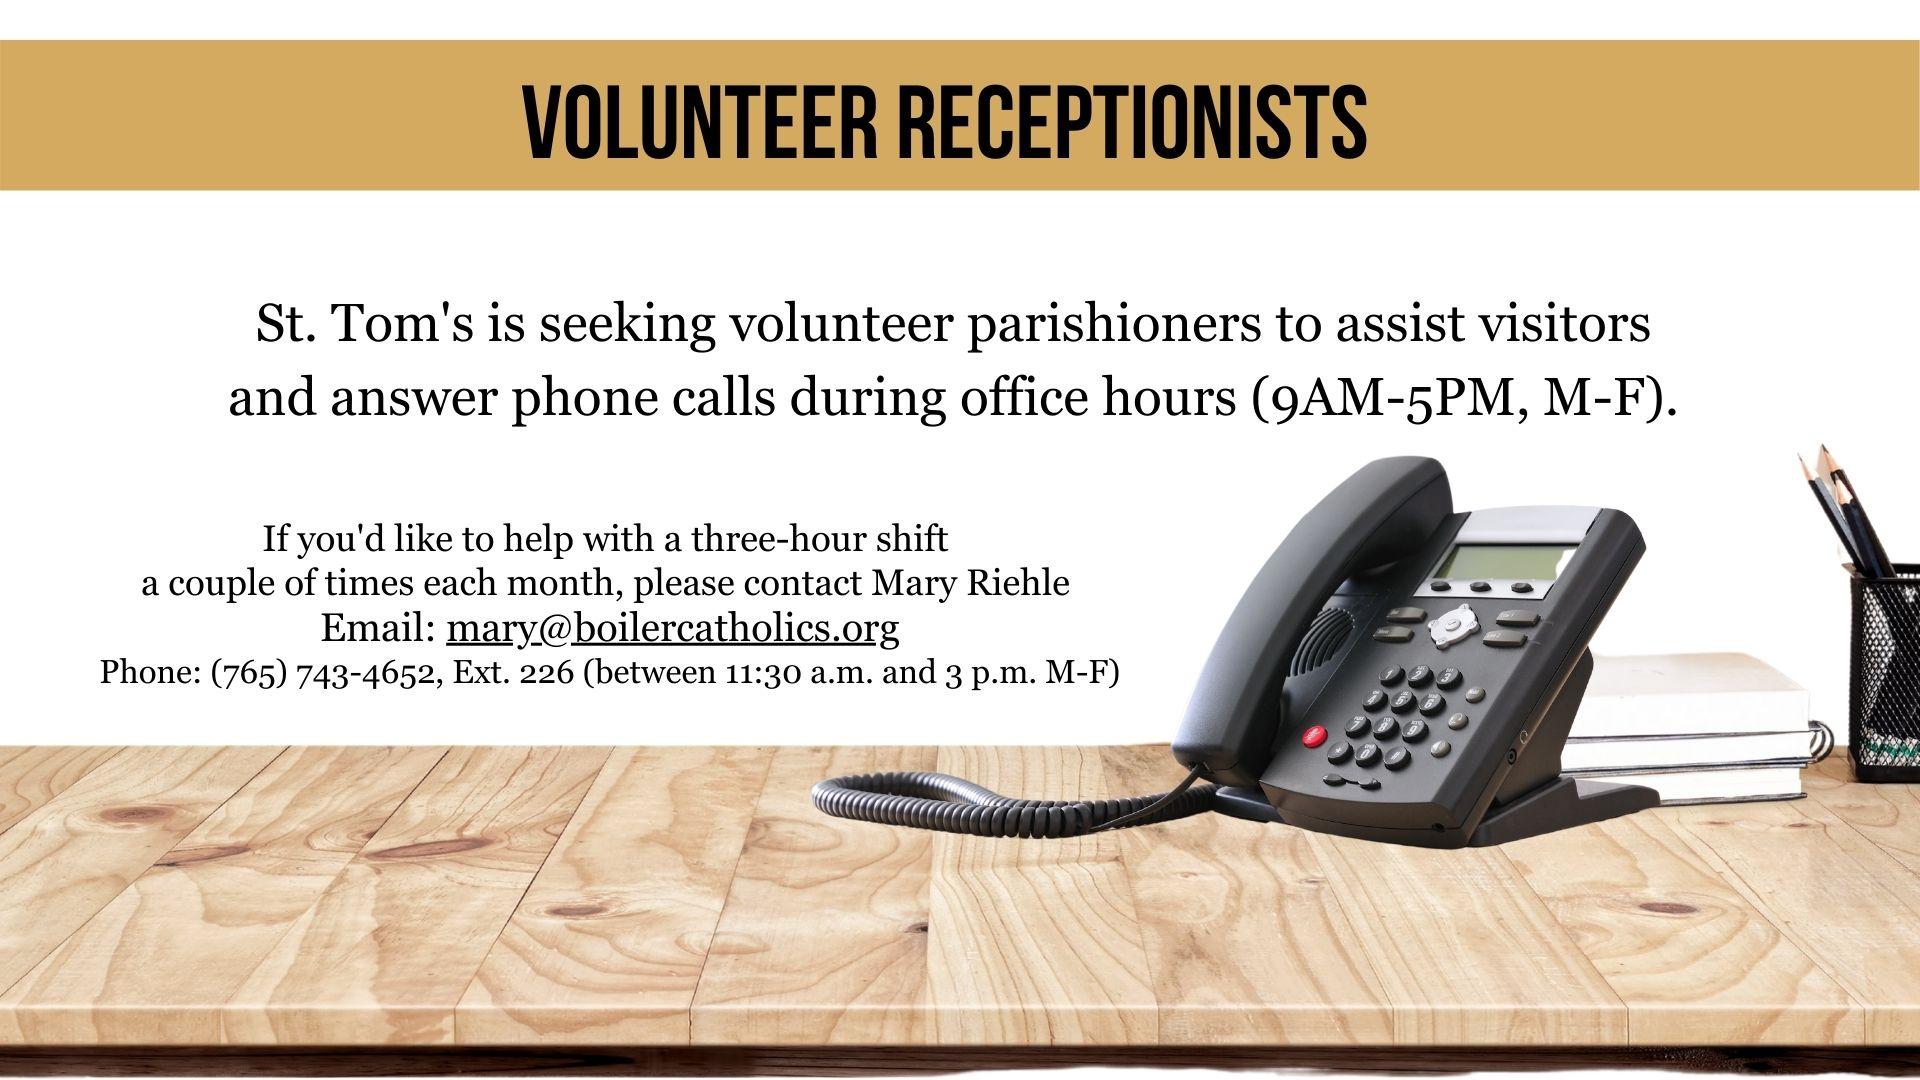 Copy-of-volunteer-summer-reception-digiboard